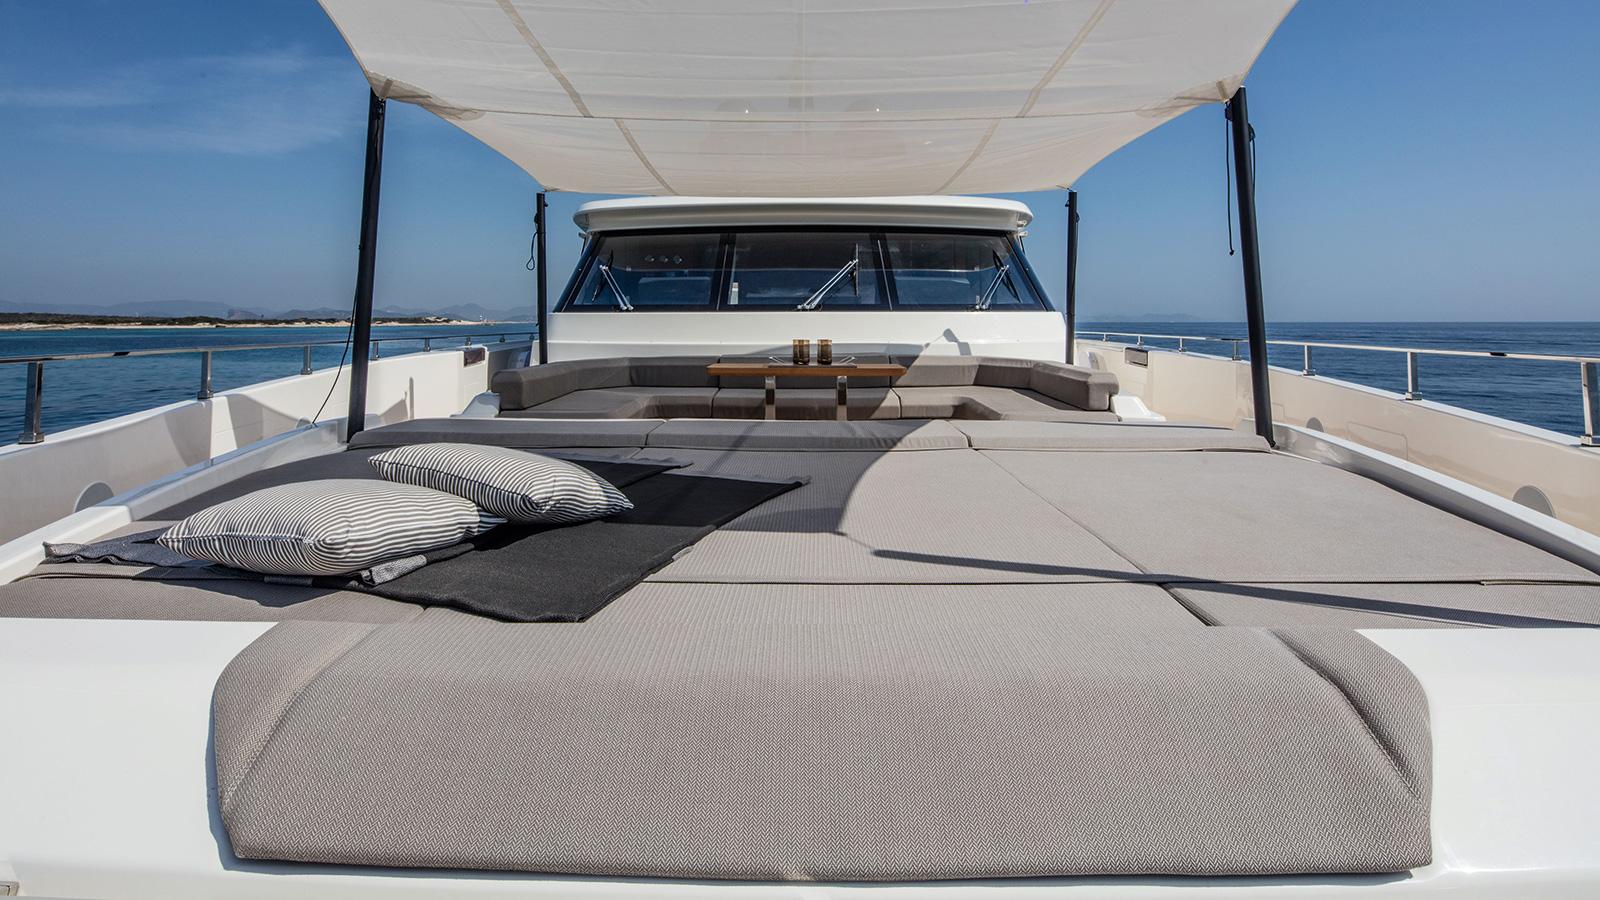 the-foredeck-of-the-ferretti-custom-line-motor-yacht-telli-credit-alberto-cocchi